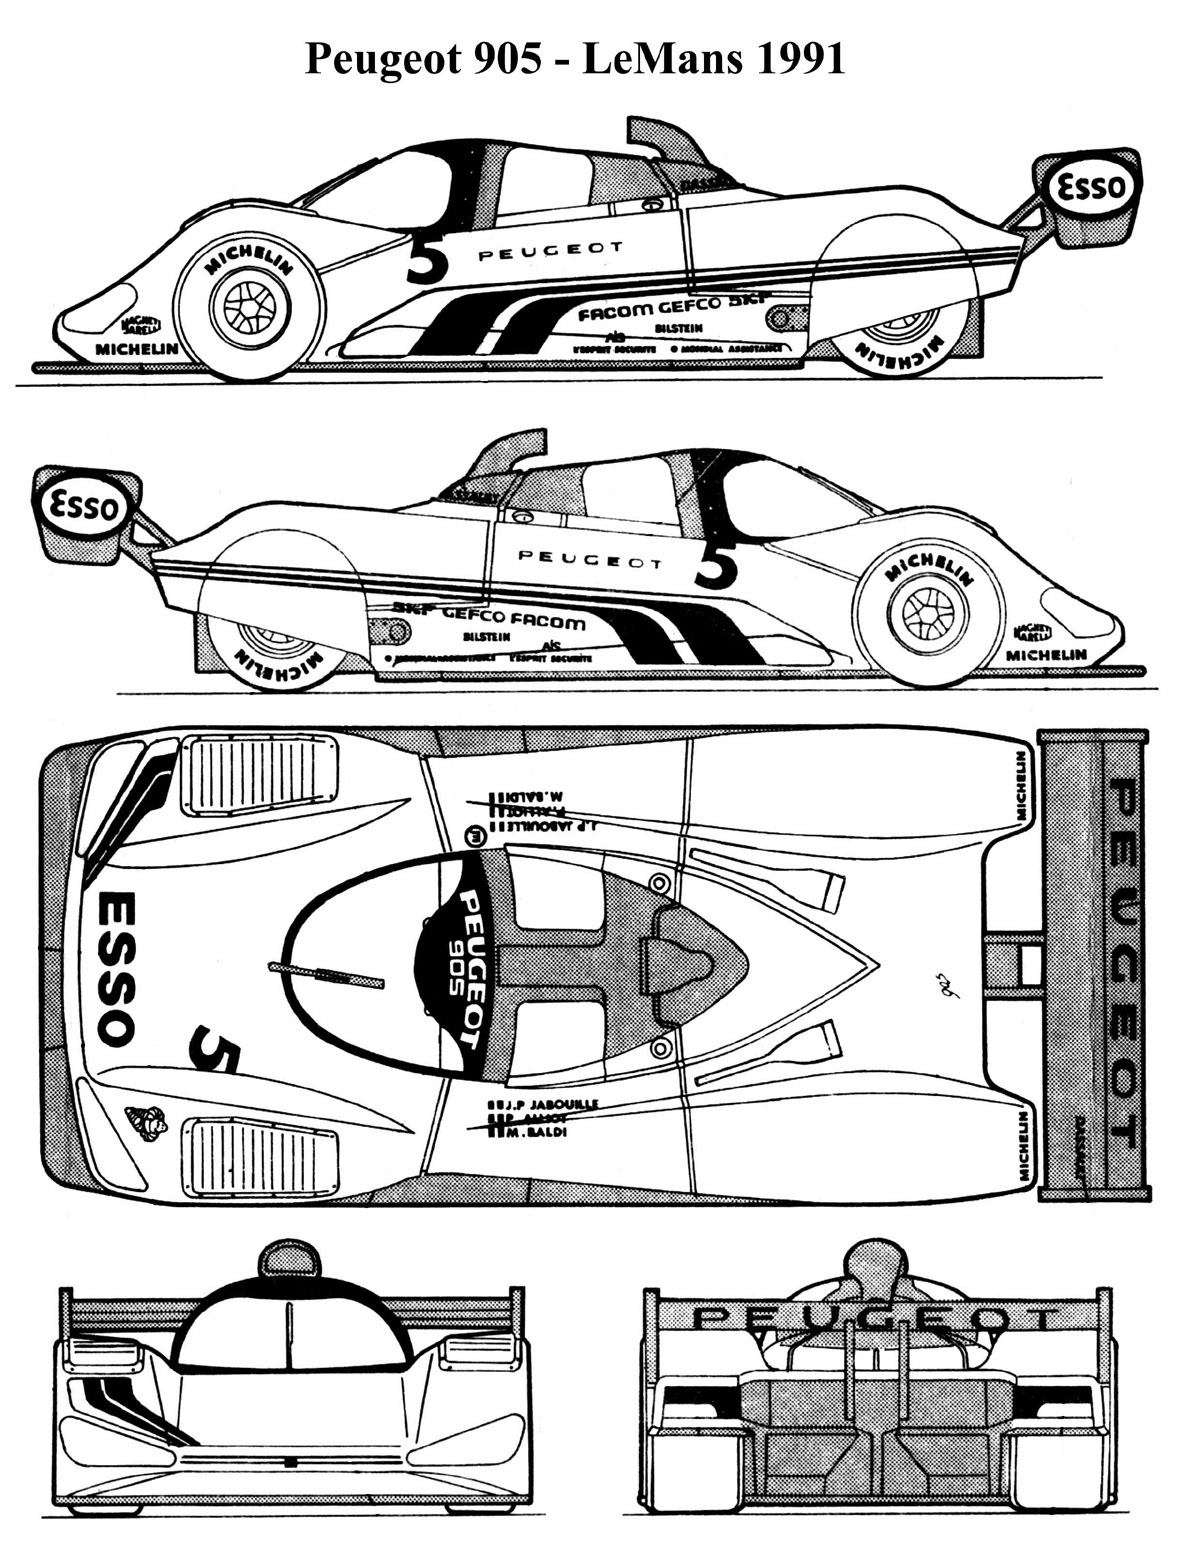 Peugeot 905 blueprint